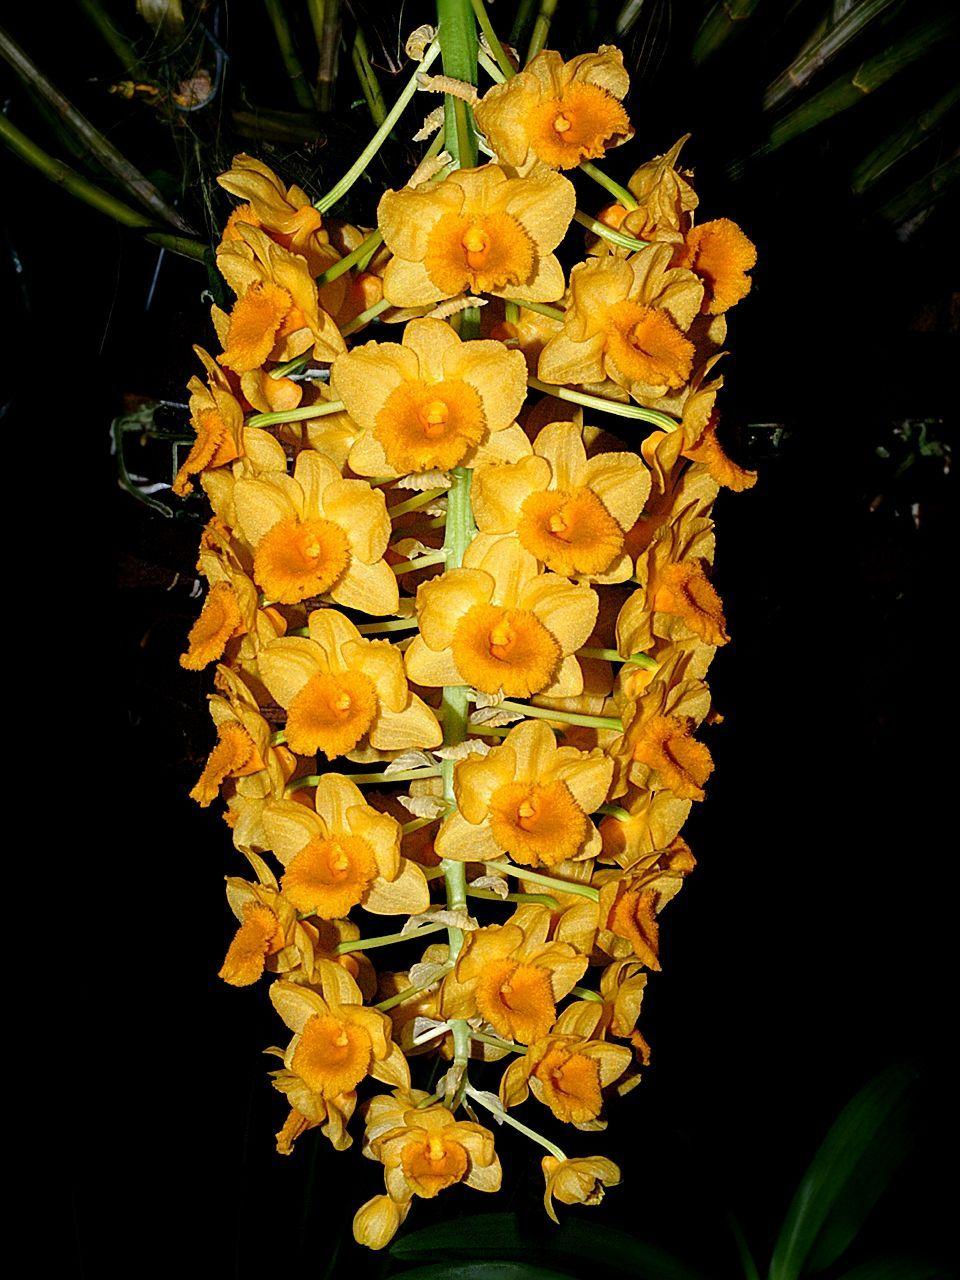 Dendrobium Densiflorum Wikipedia Dendrobium Orchids Beautiful Orchids Orchids Garden